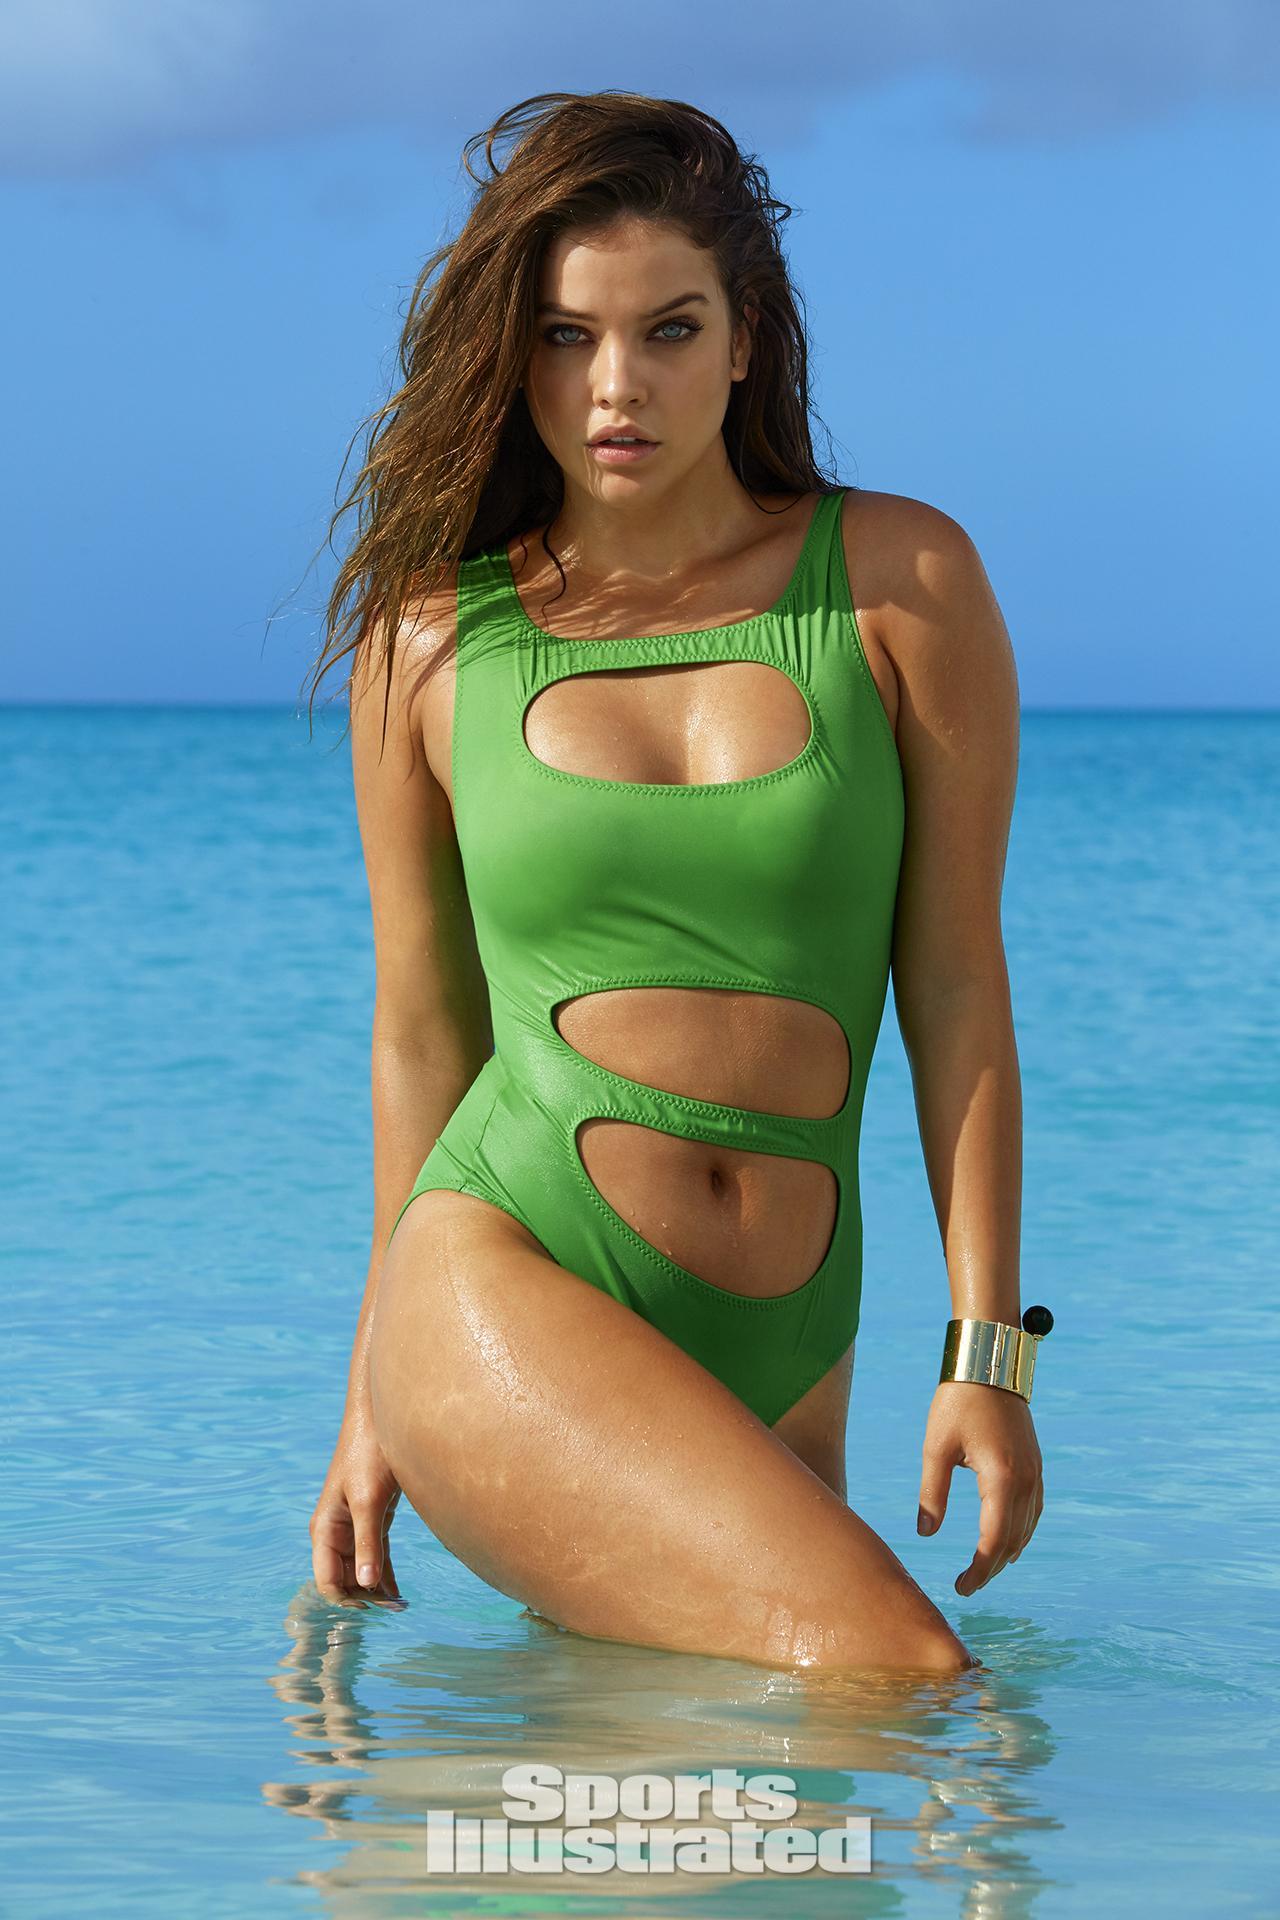 Barbara Palvin Swimsuit Photos, Sports Illustrated Swimsuit 2016